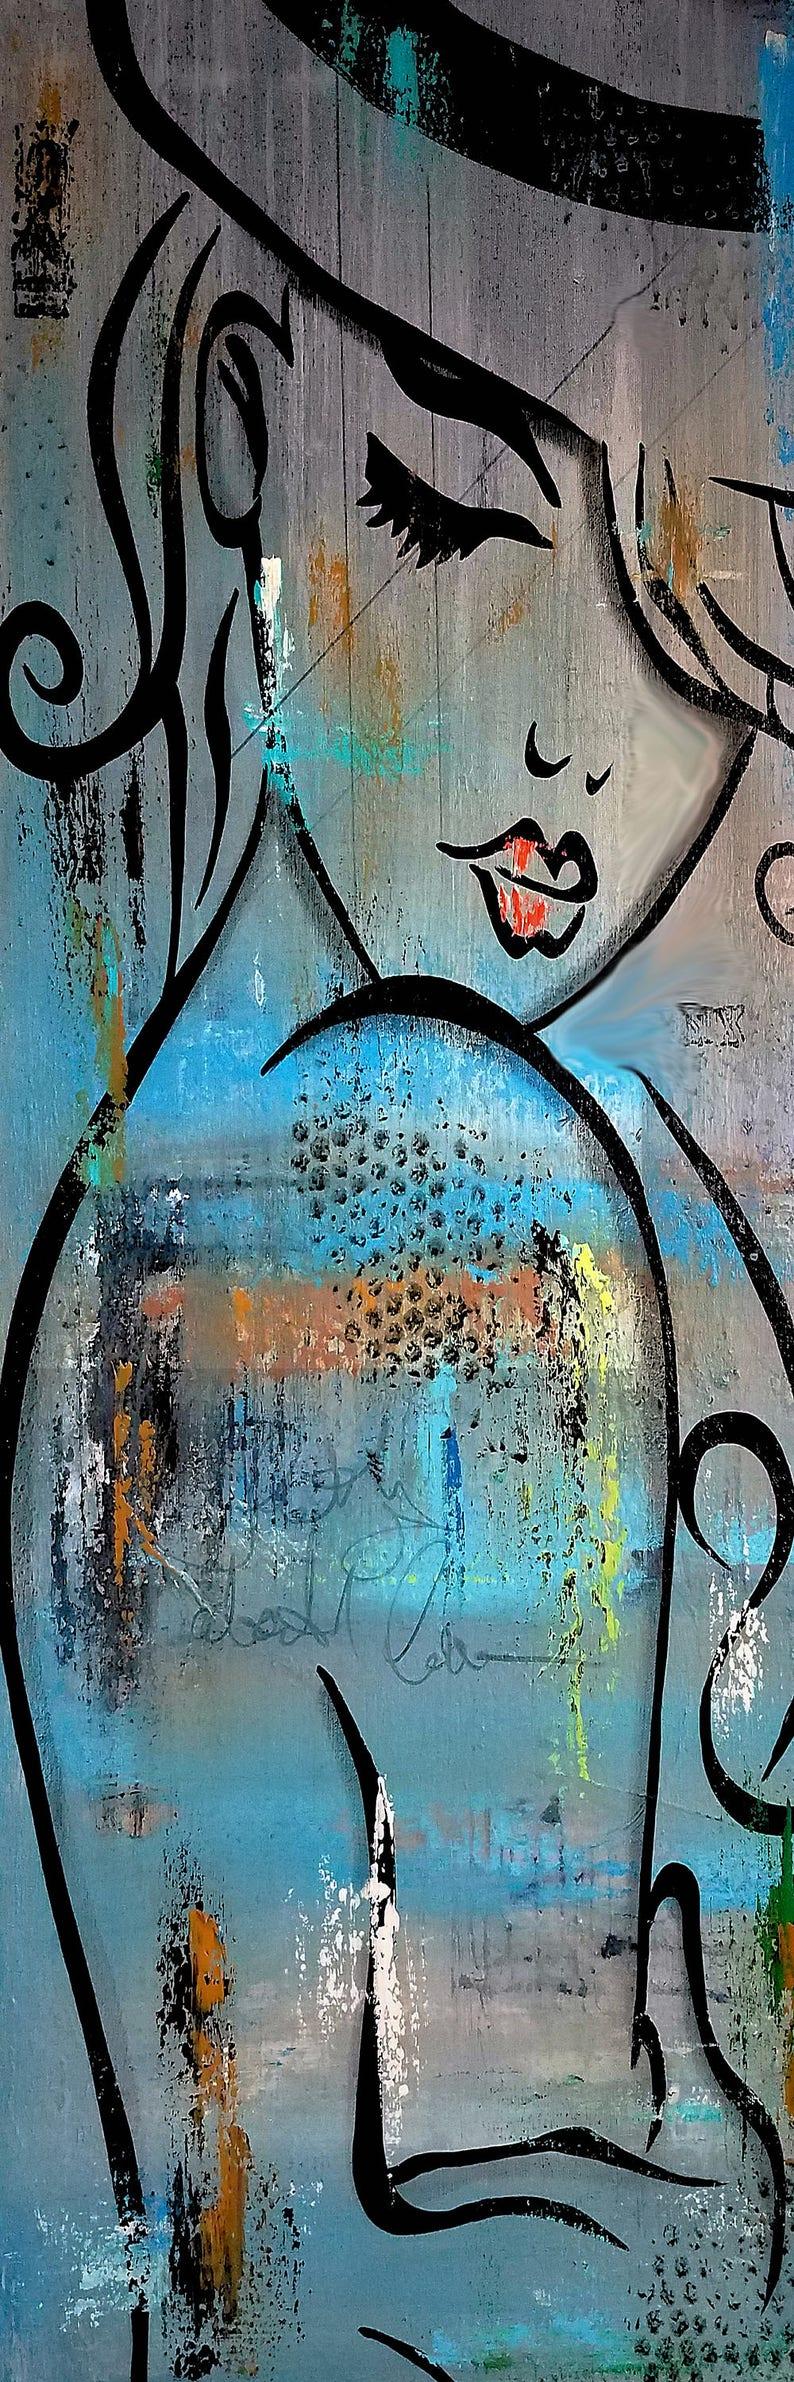 Moonlit artistic nude woman print. An emotional oil